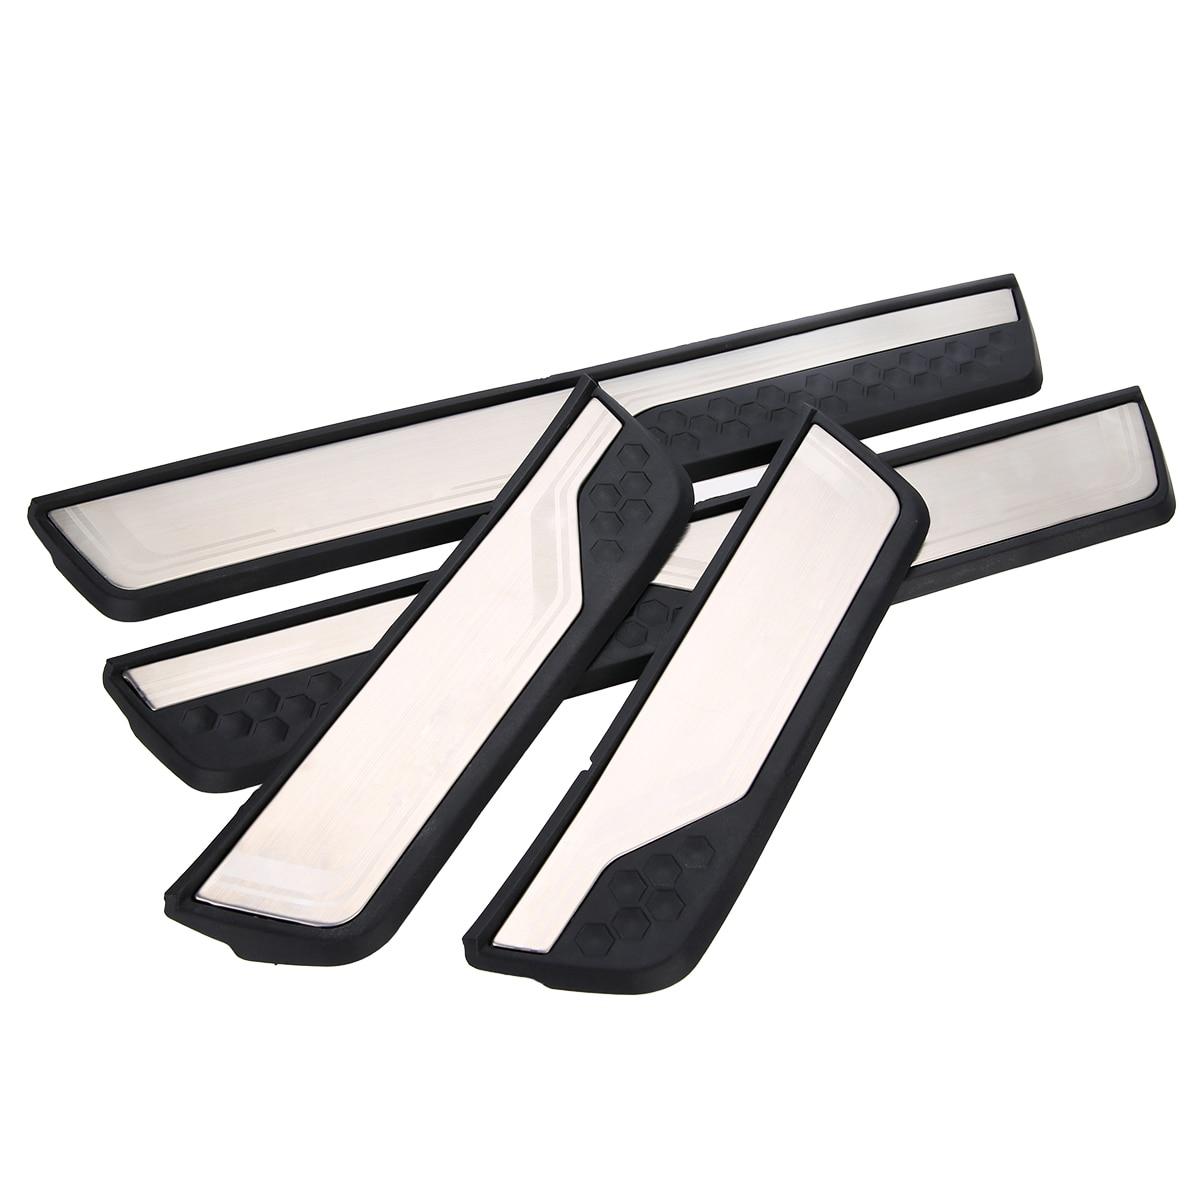 цена на Mayitr Car Accessories 4pcs Door Sill Trim Cover Plate Panel Protector Guard For Honda CR-V 2017 2018